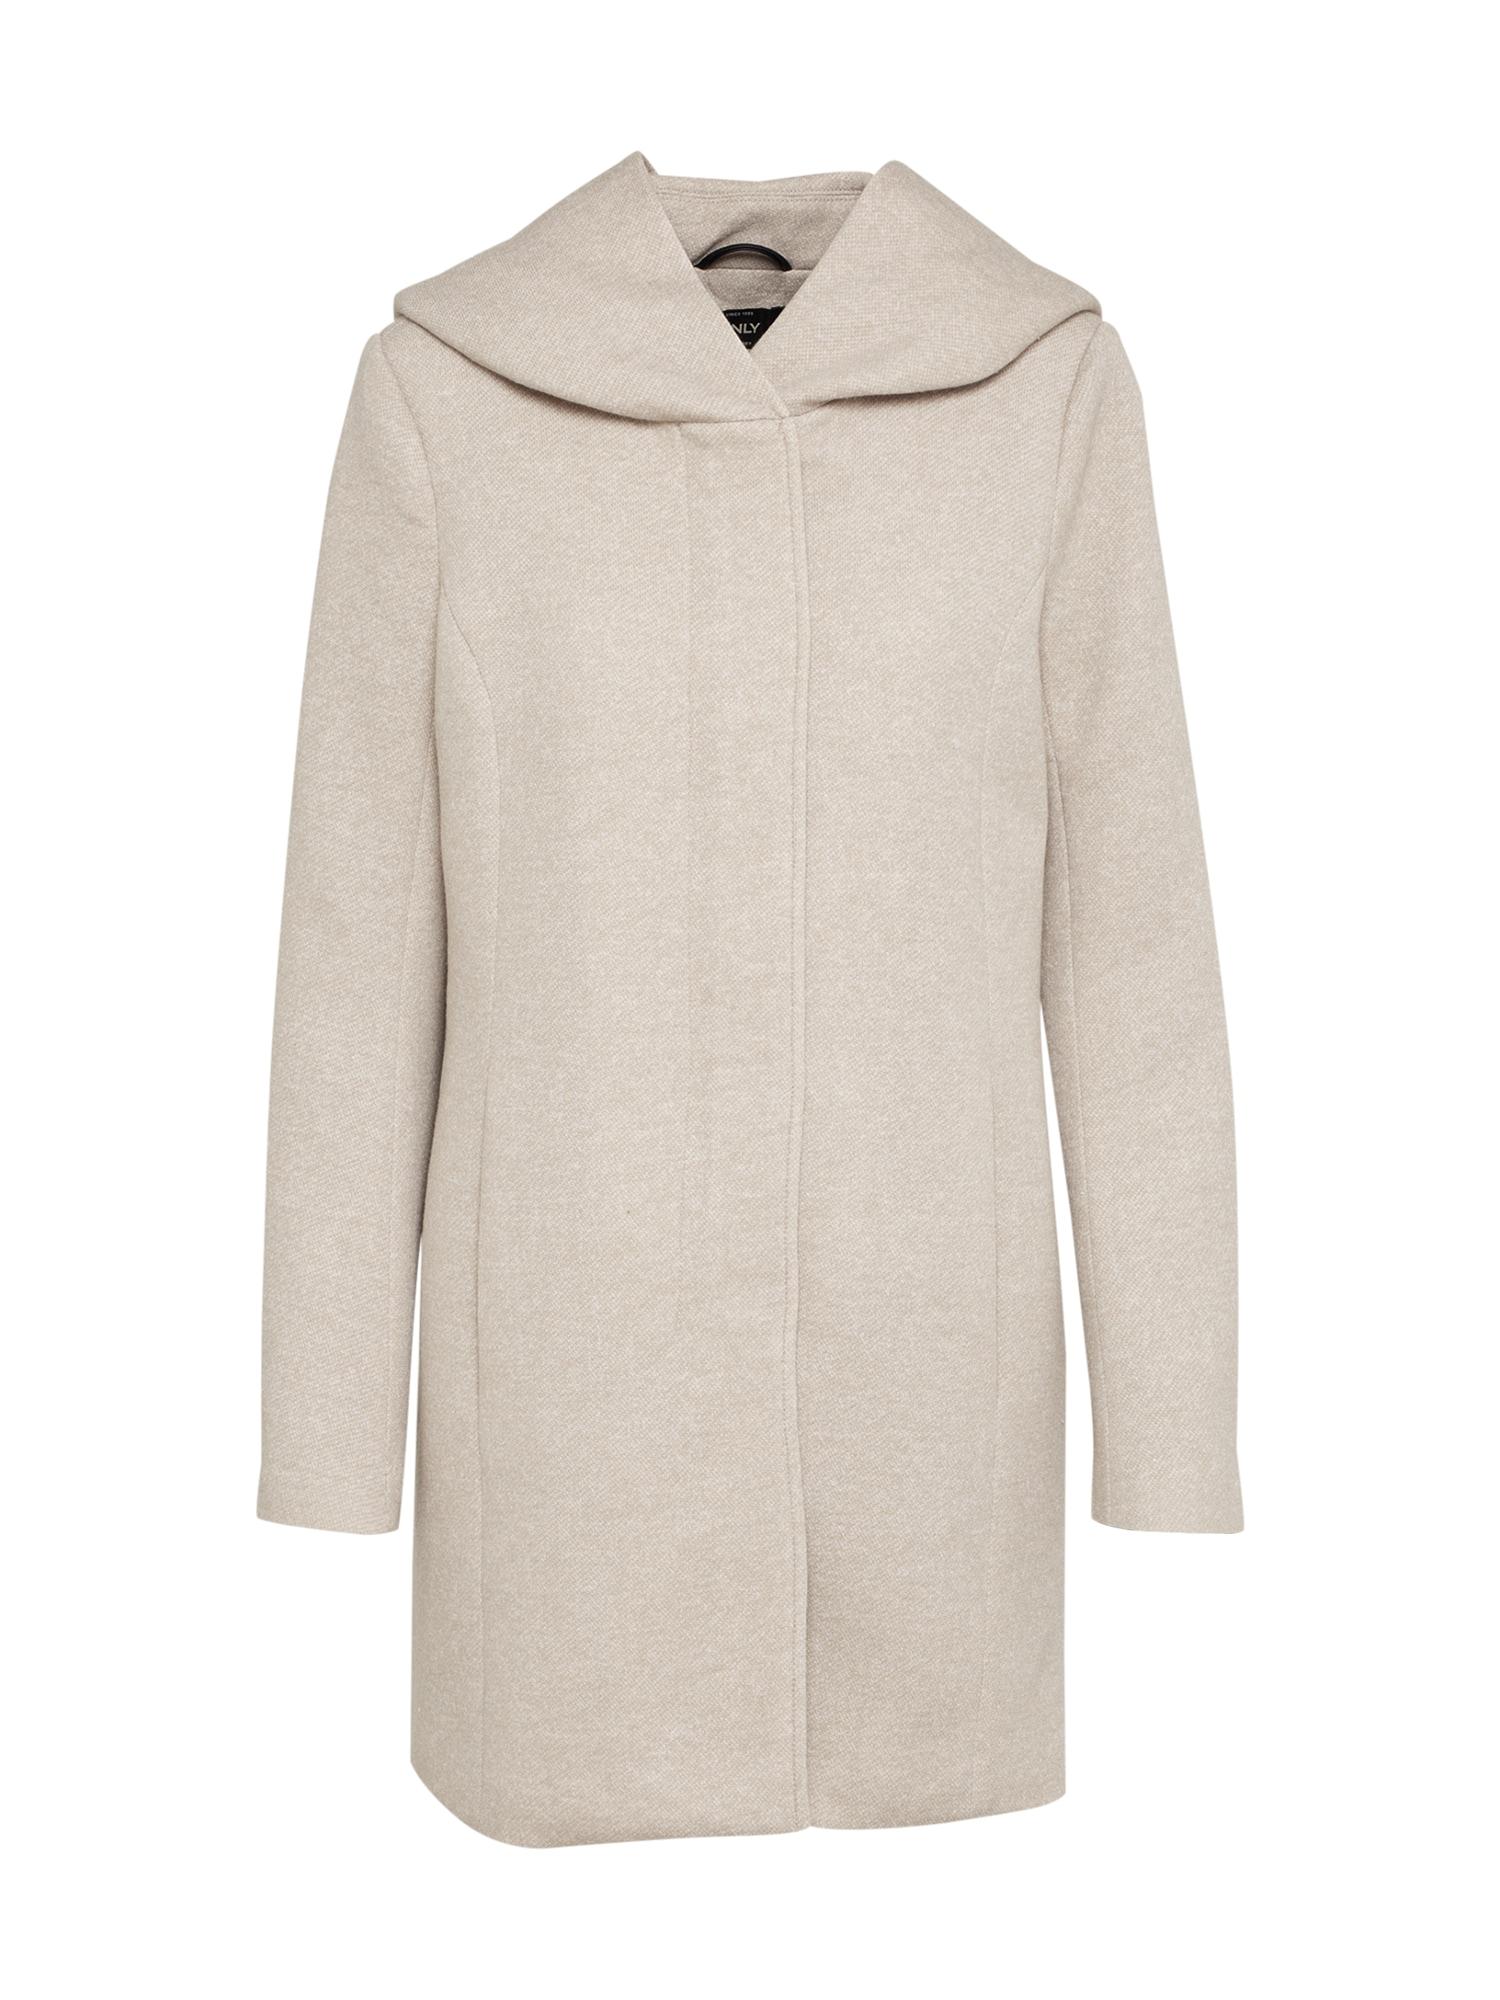 ONLY Rudeninis-žieminis paltas 'onlSEDONA' gelsvai pilka spalva